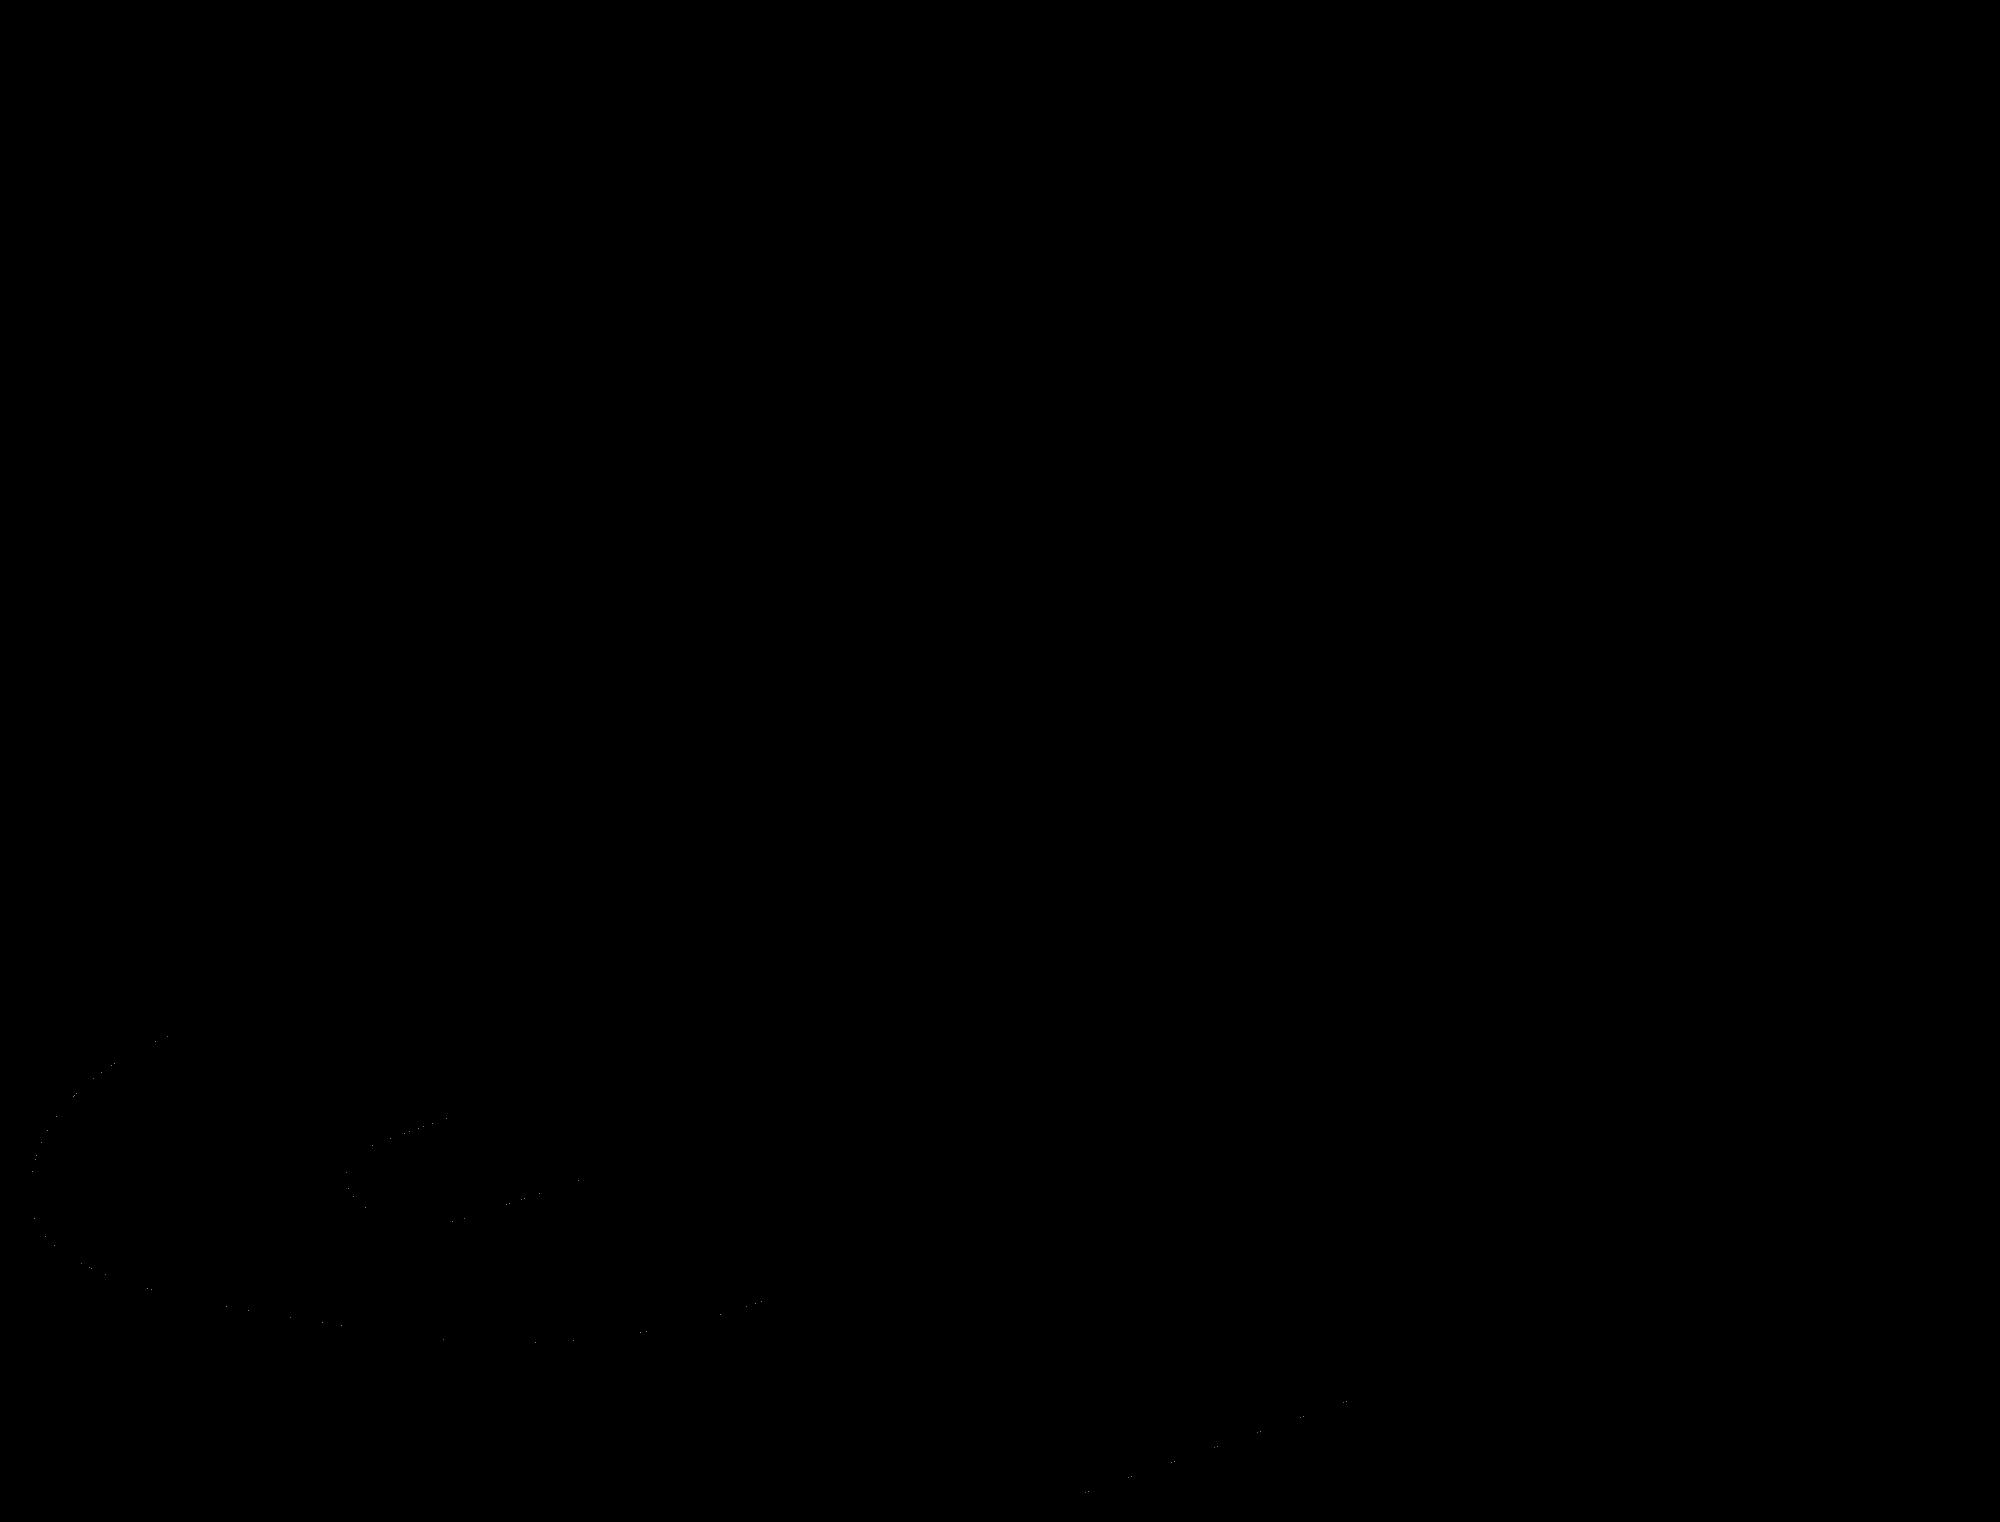 Playstation.png - Playstation, Transparent background PNG HD thumbnail